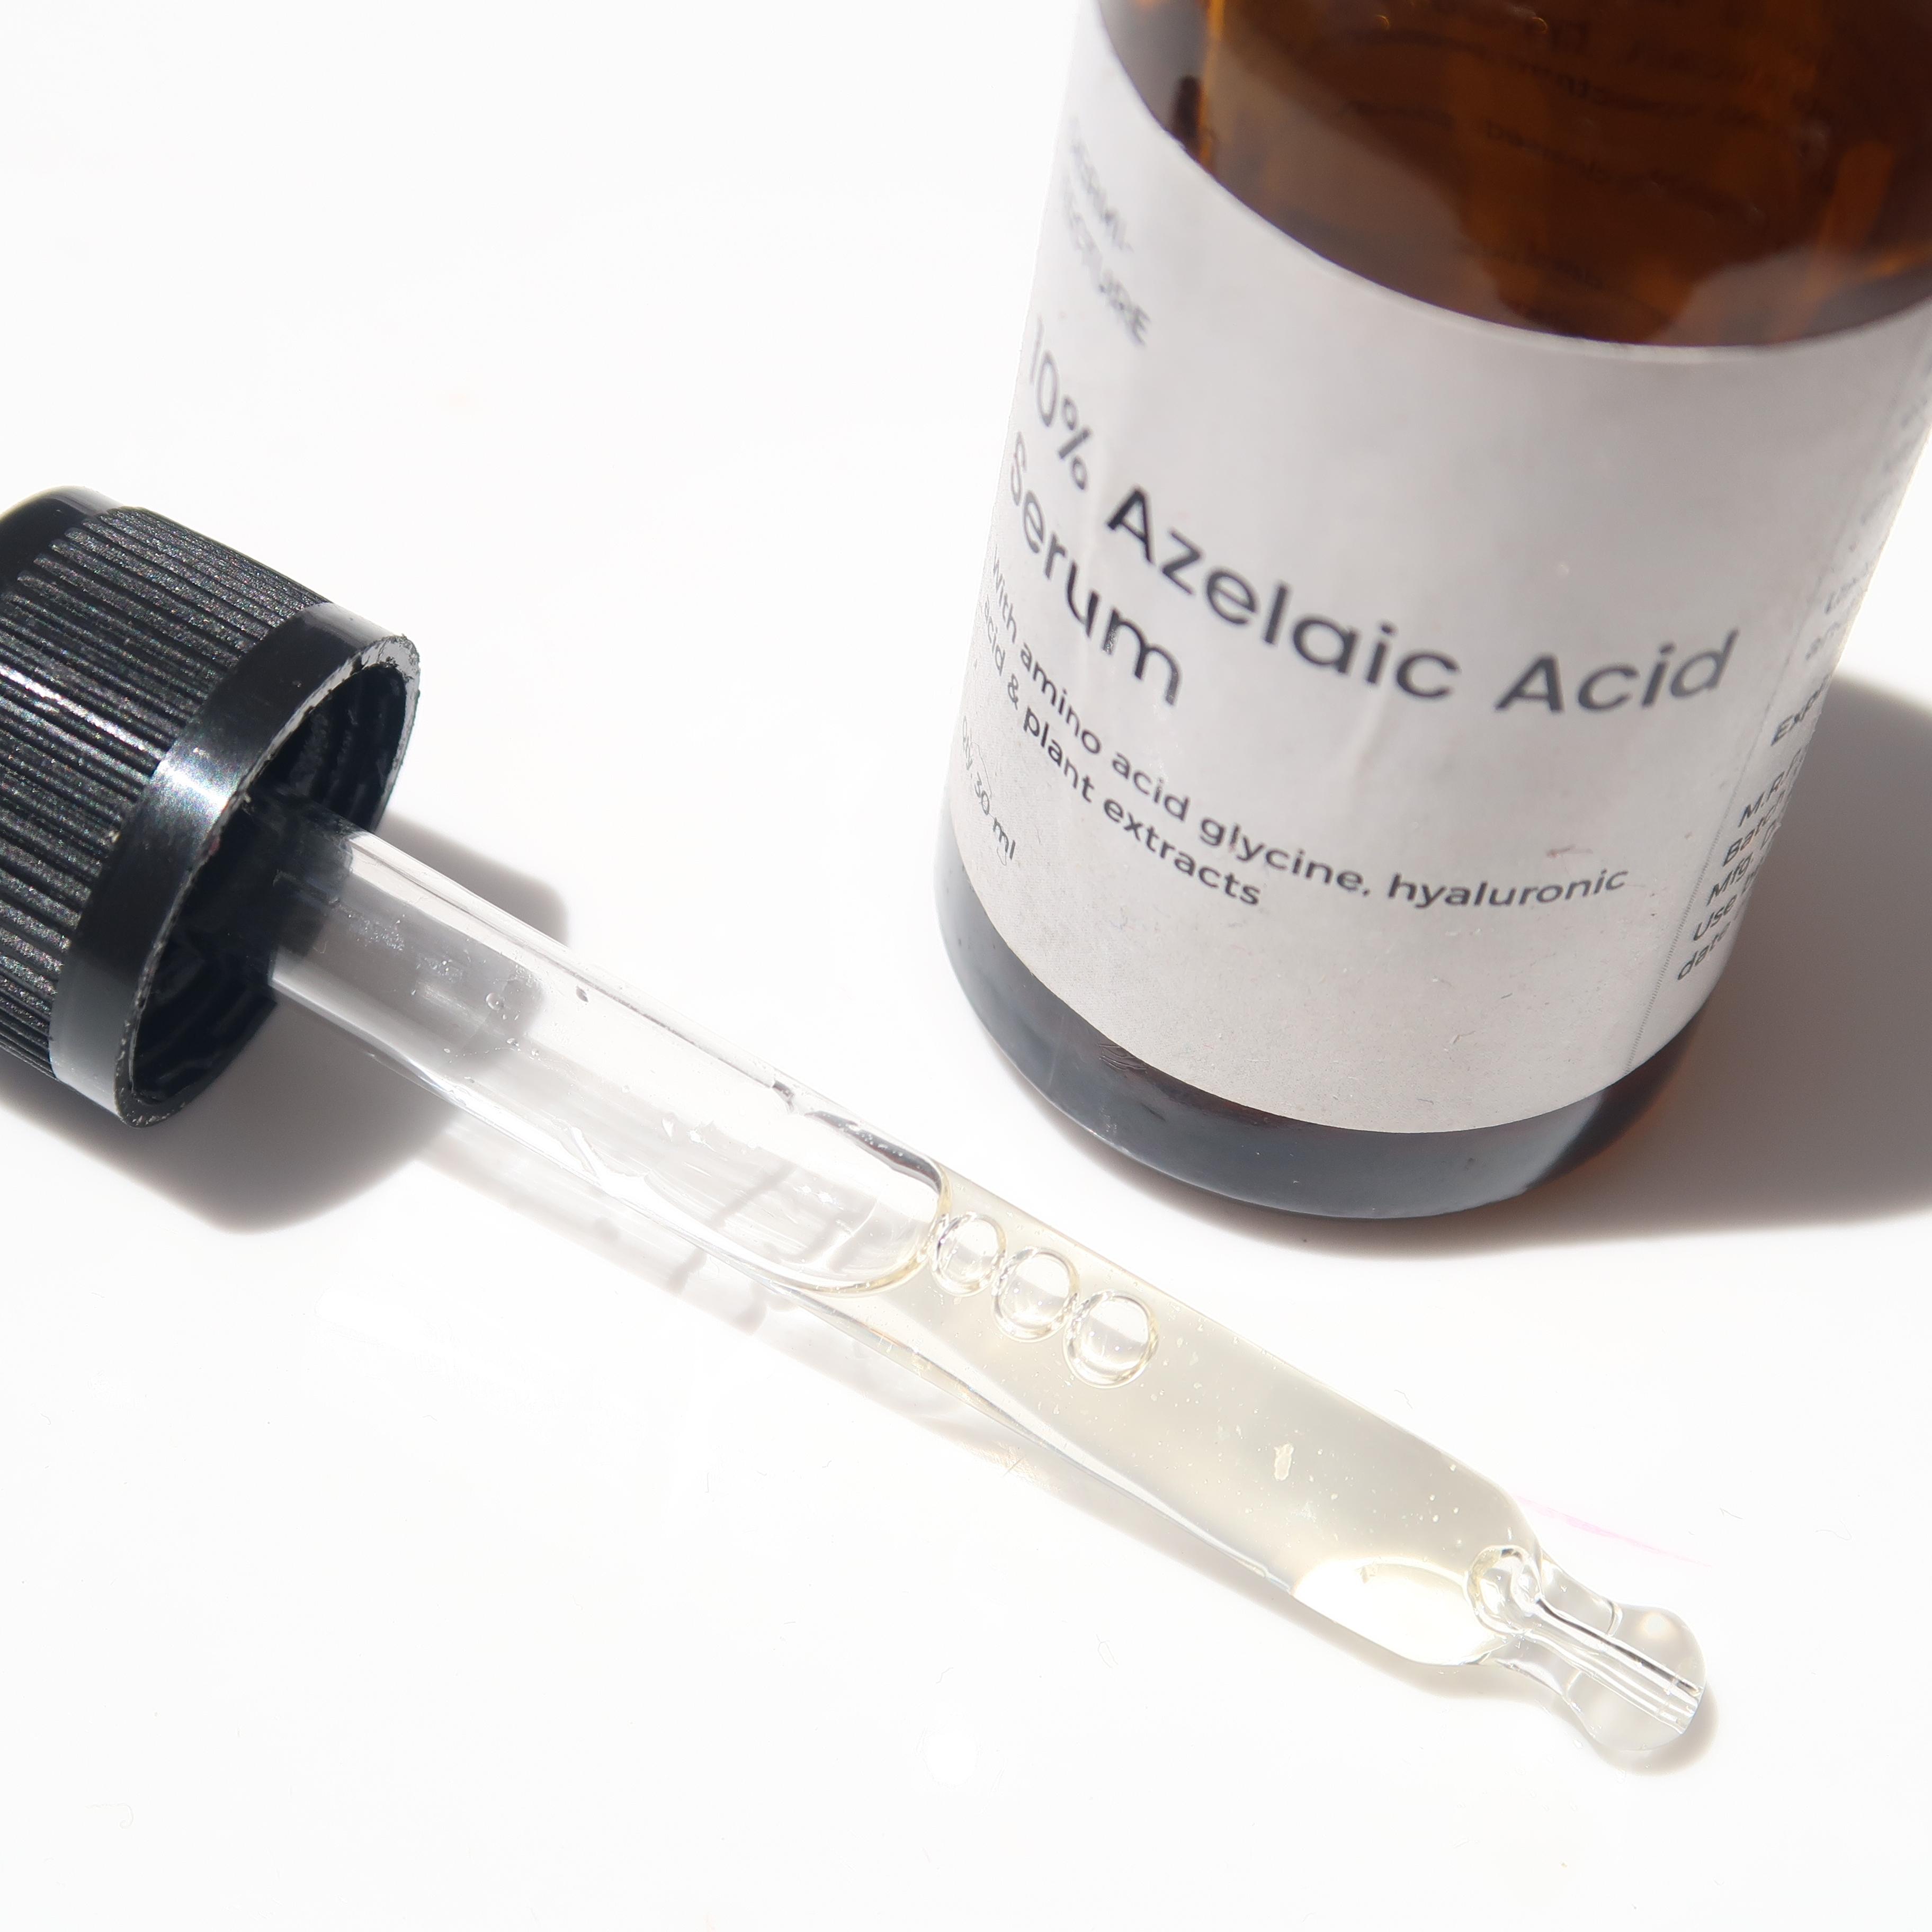 Dermitecture Azelaic Acid Serum | Review